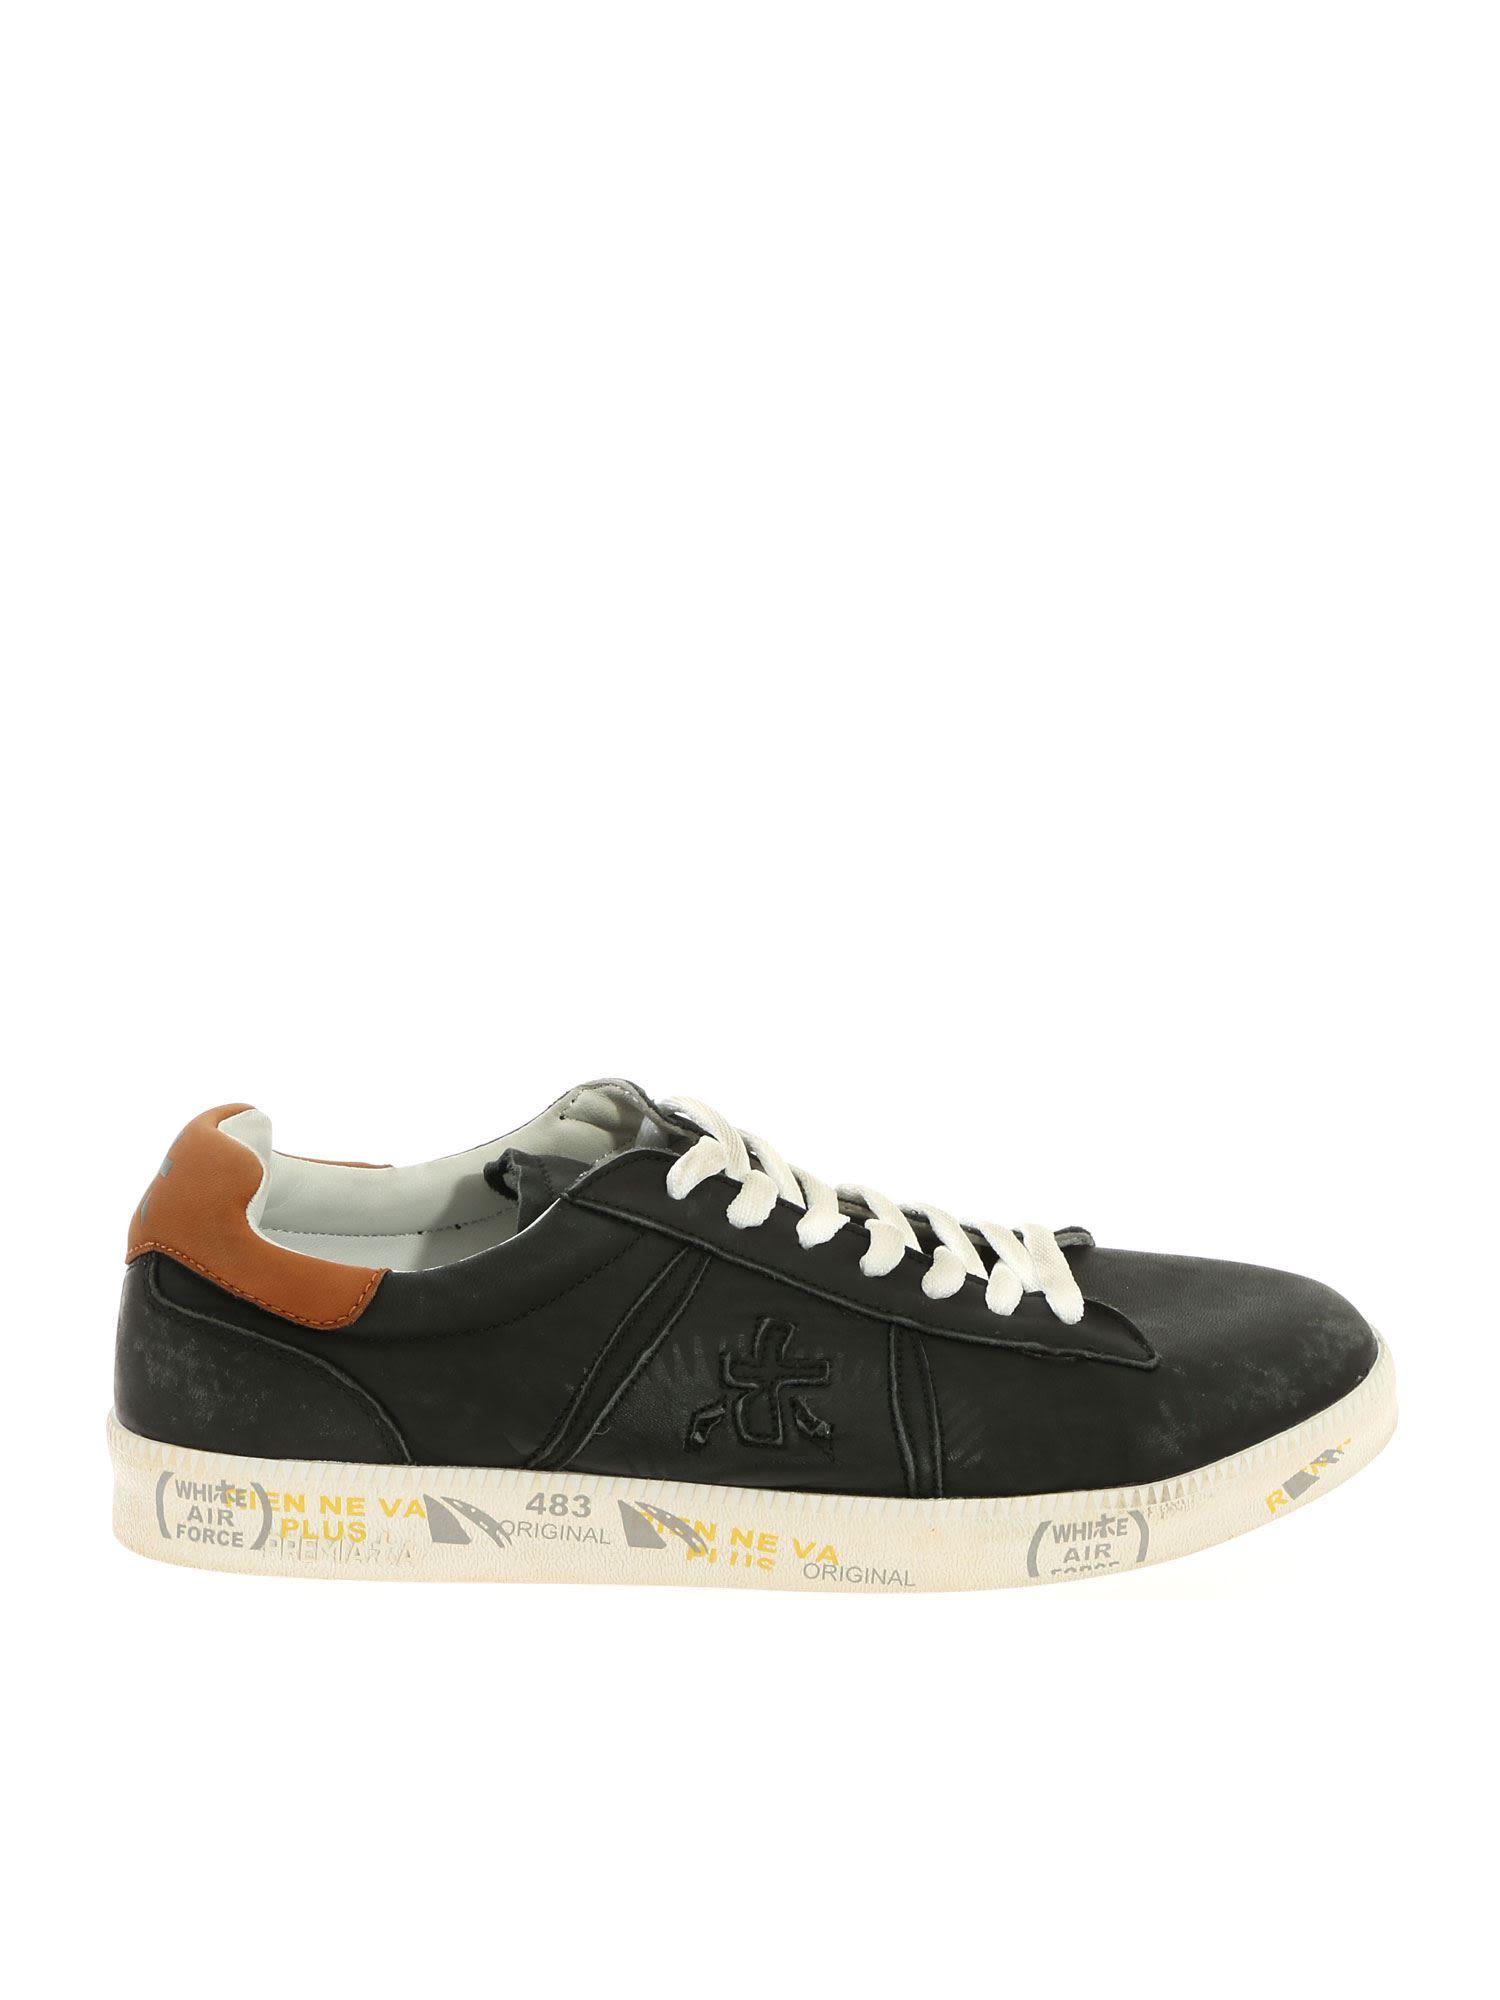 Premiata Andy 3273 Sneakers